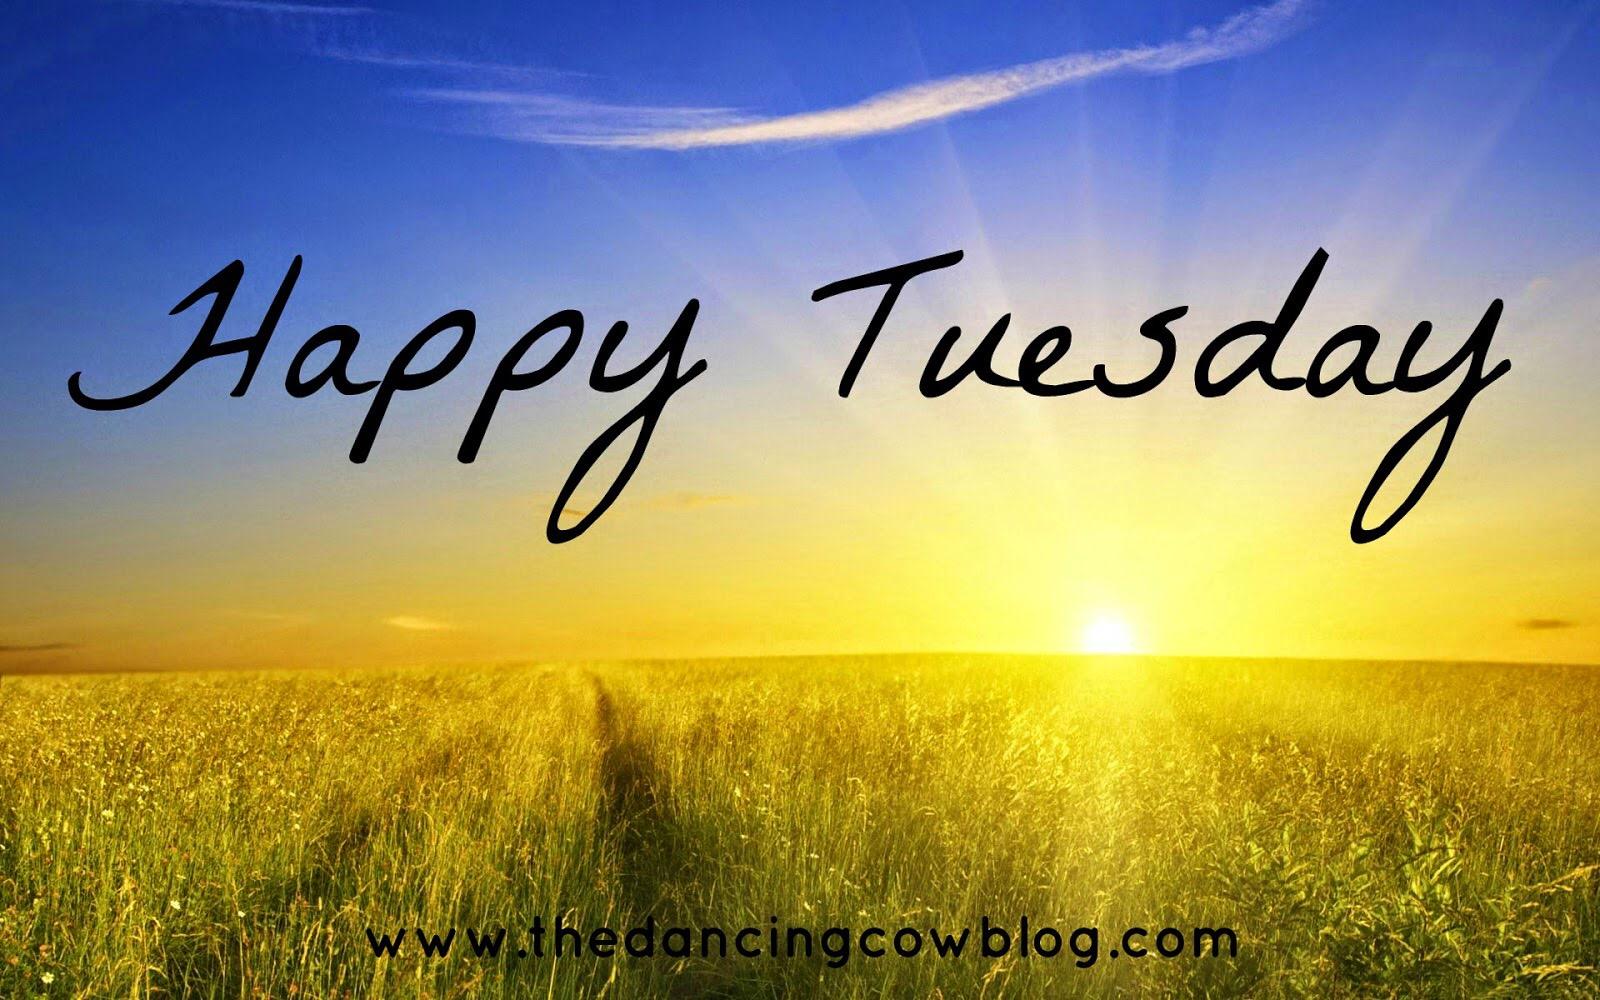 Happy Tuesday Evening